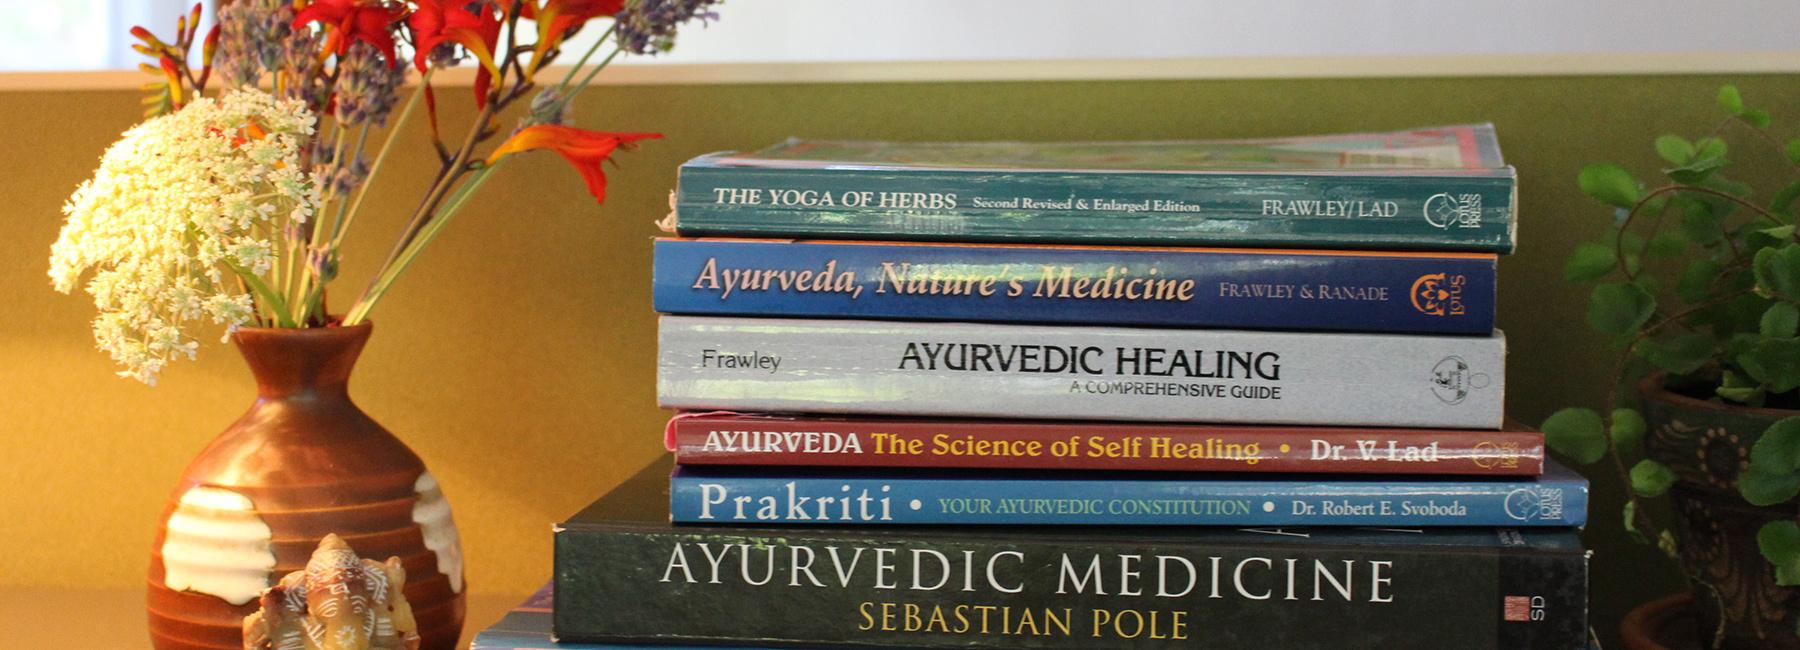 Sanskrit Glossary for Ayurvedic Terms | Banyan Botanicals